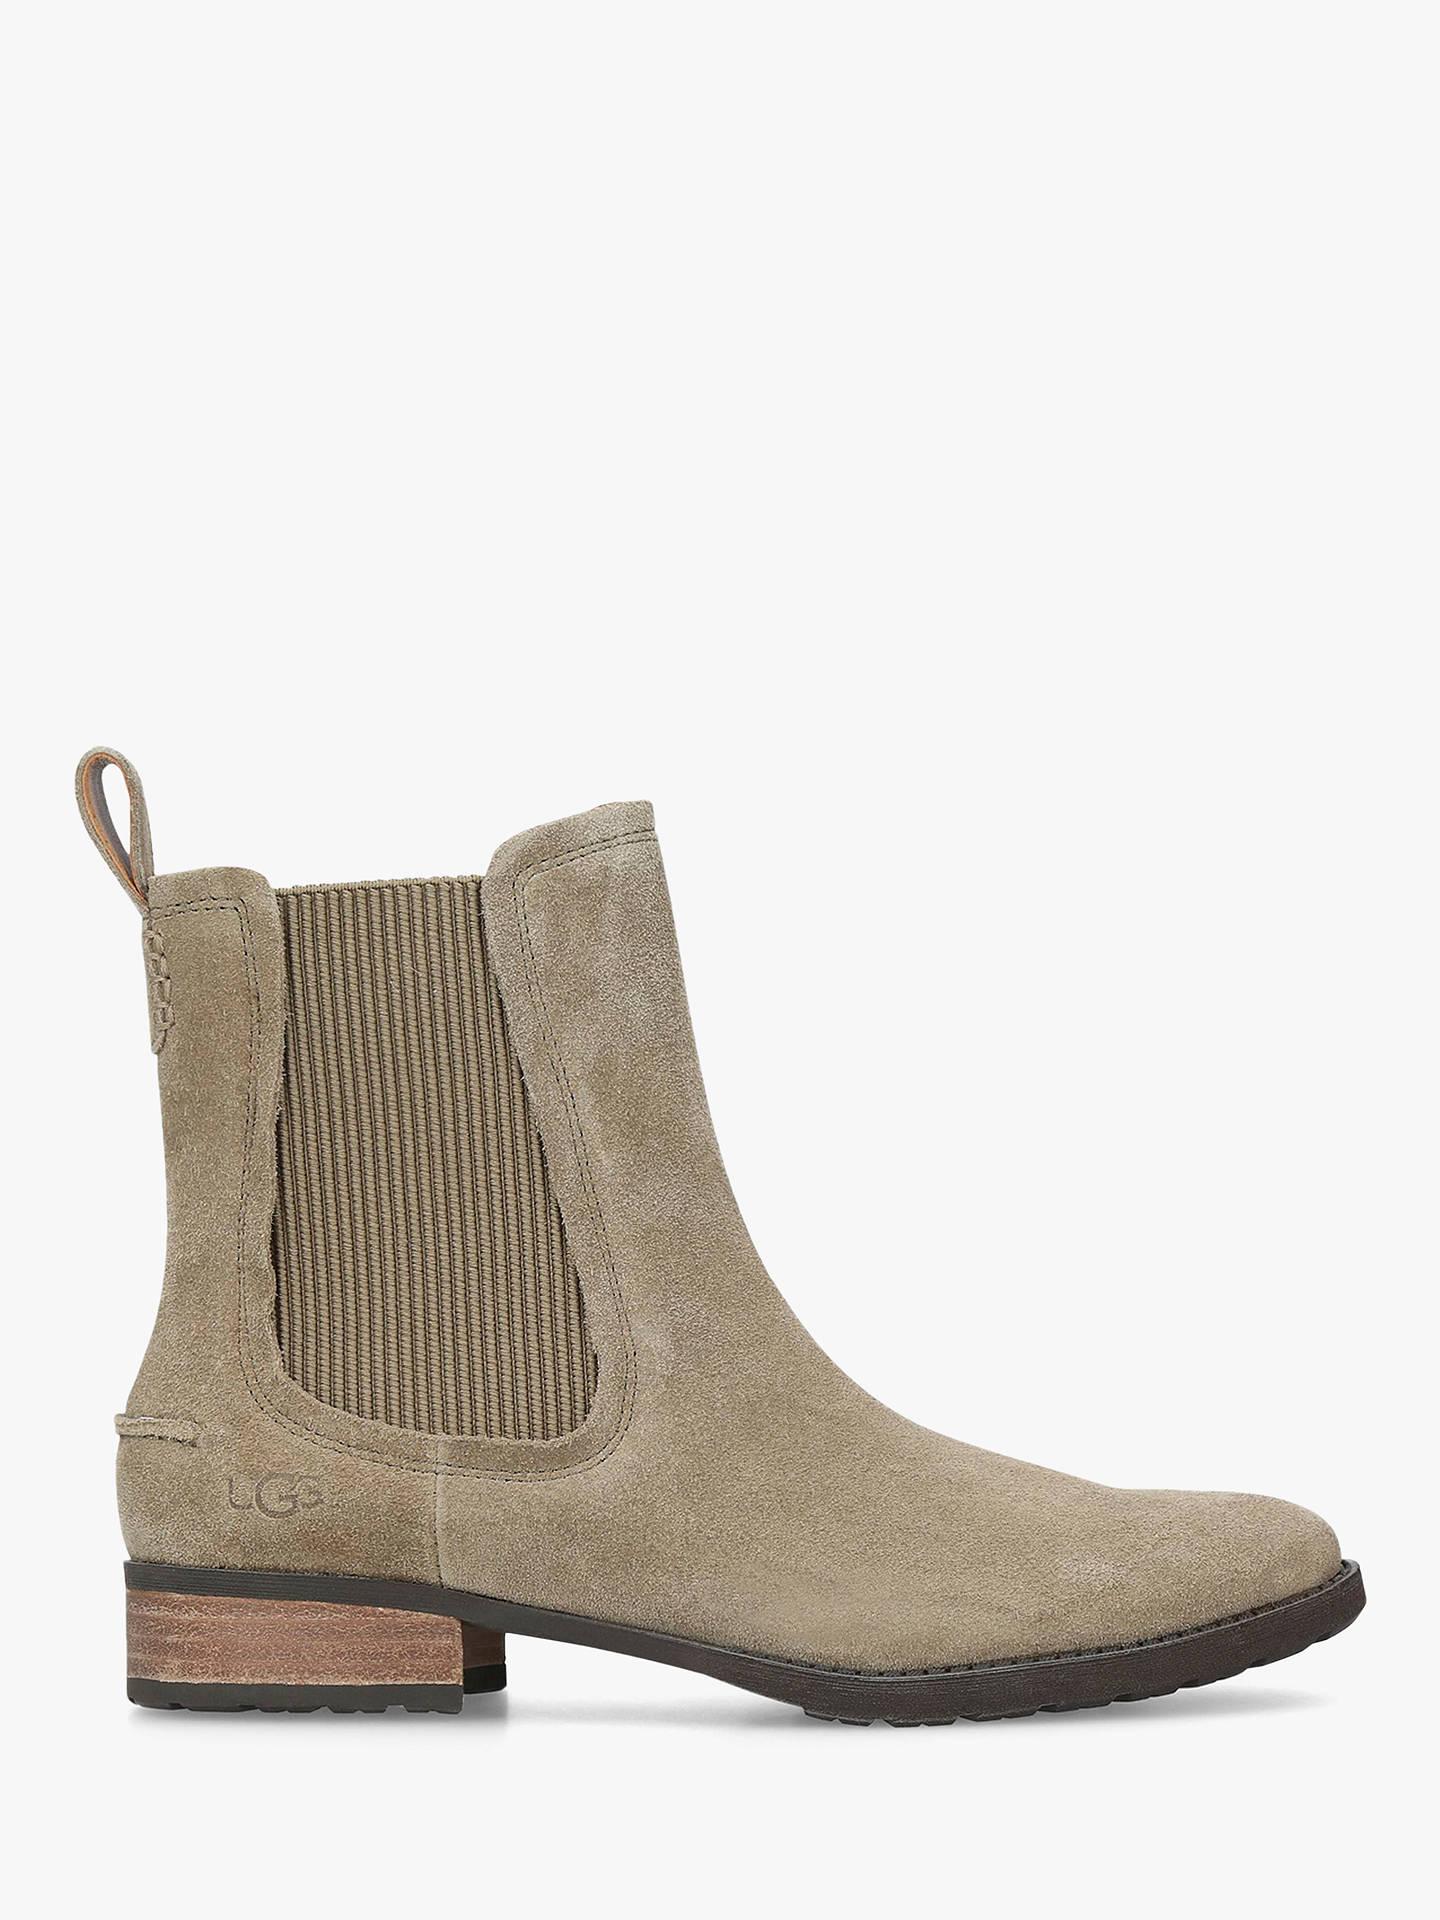 15086e618 Buy UGG Hillhurst Ankle Boots, Mid Brown Suede, 5 Online at johnlewis.com  ...